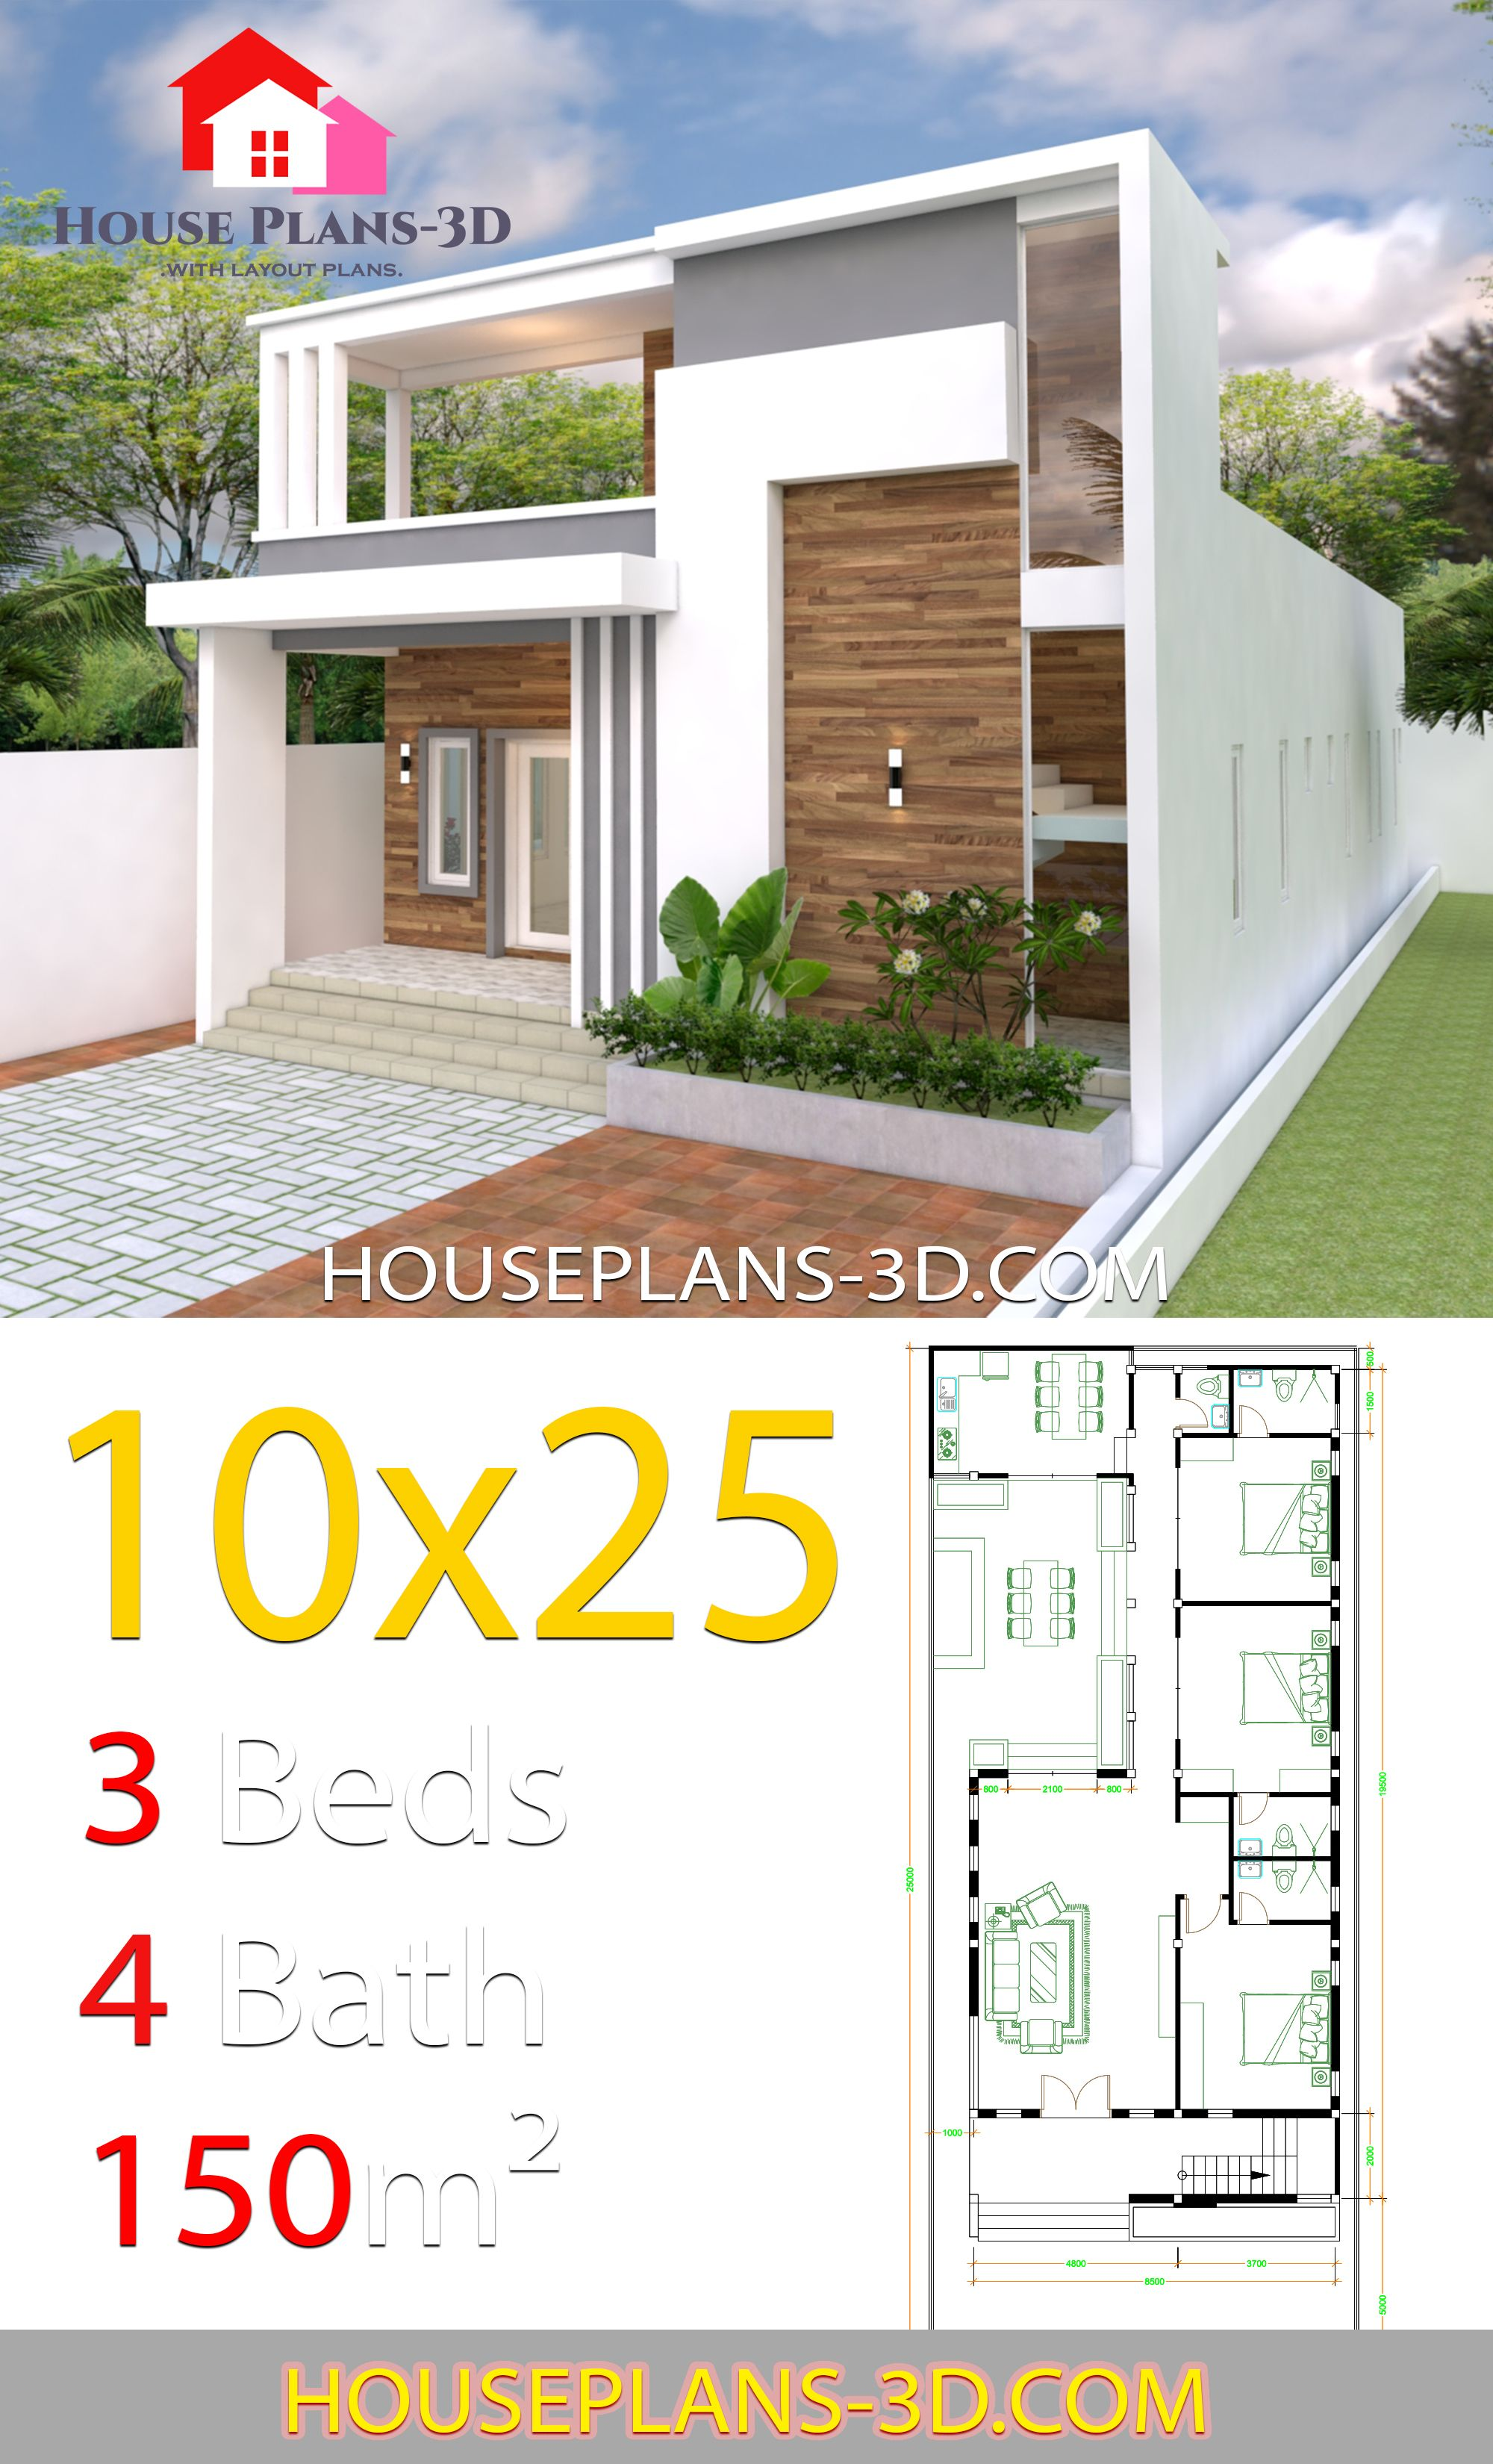 House Design Plans 10x25 With 3 Bedrooms House Plans 3d Single Floor House Design Duplex House Design Home Design Plans